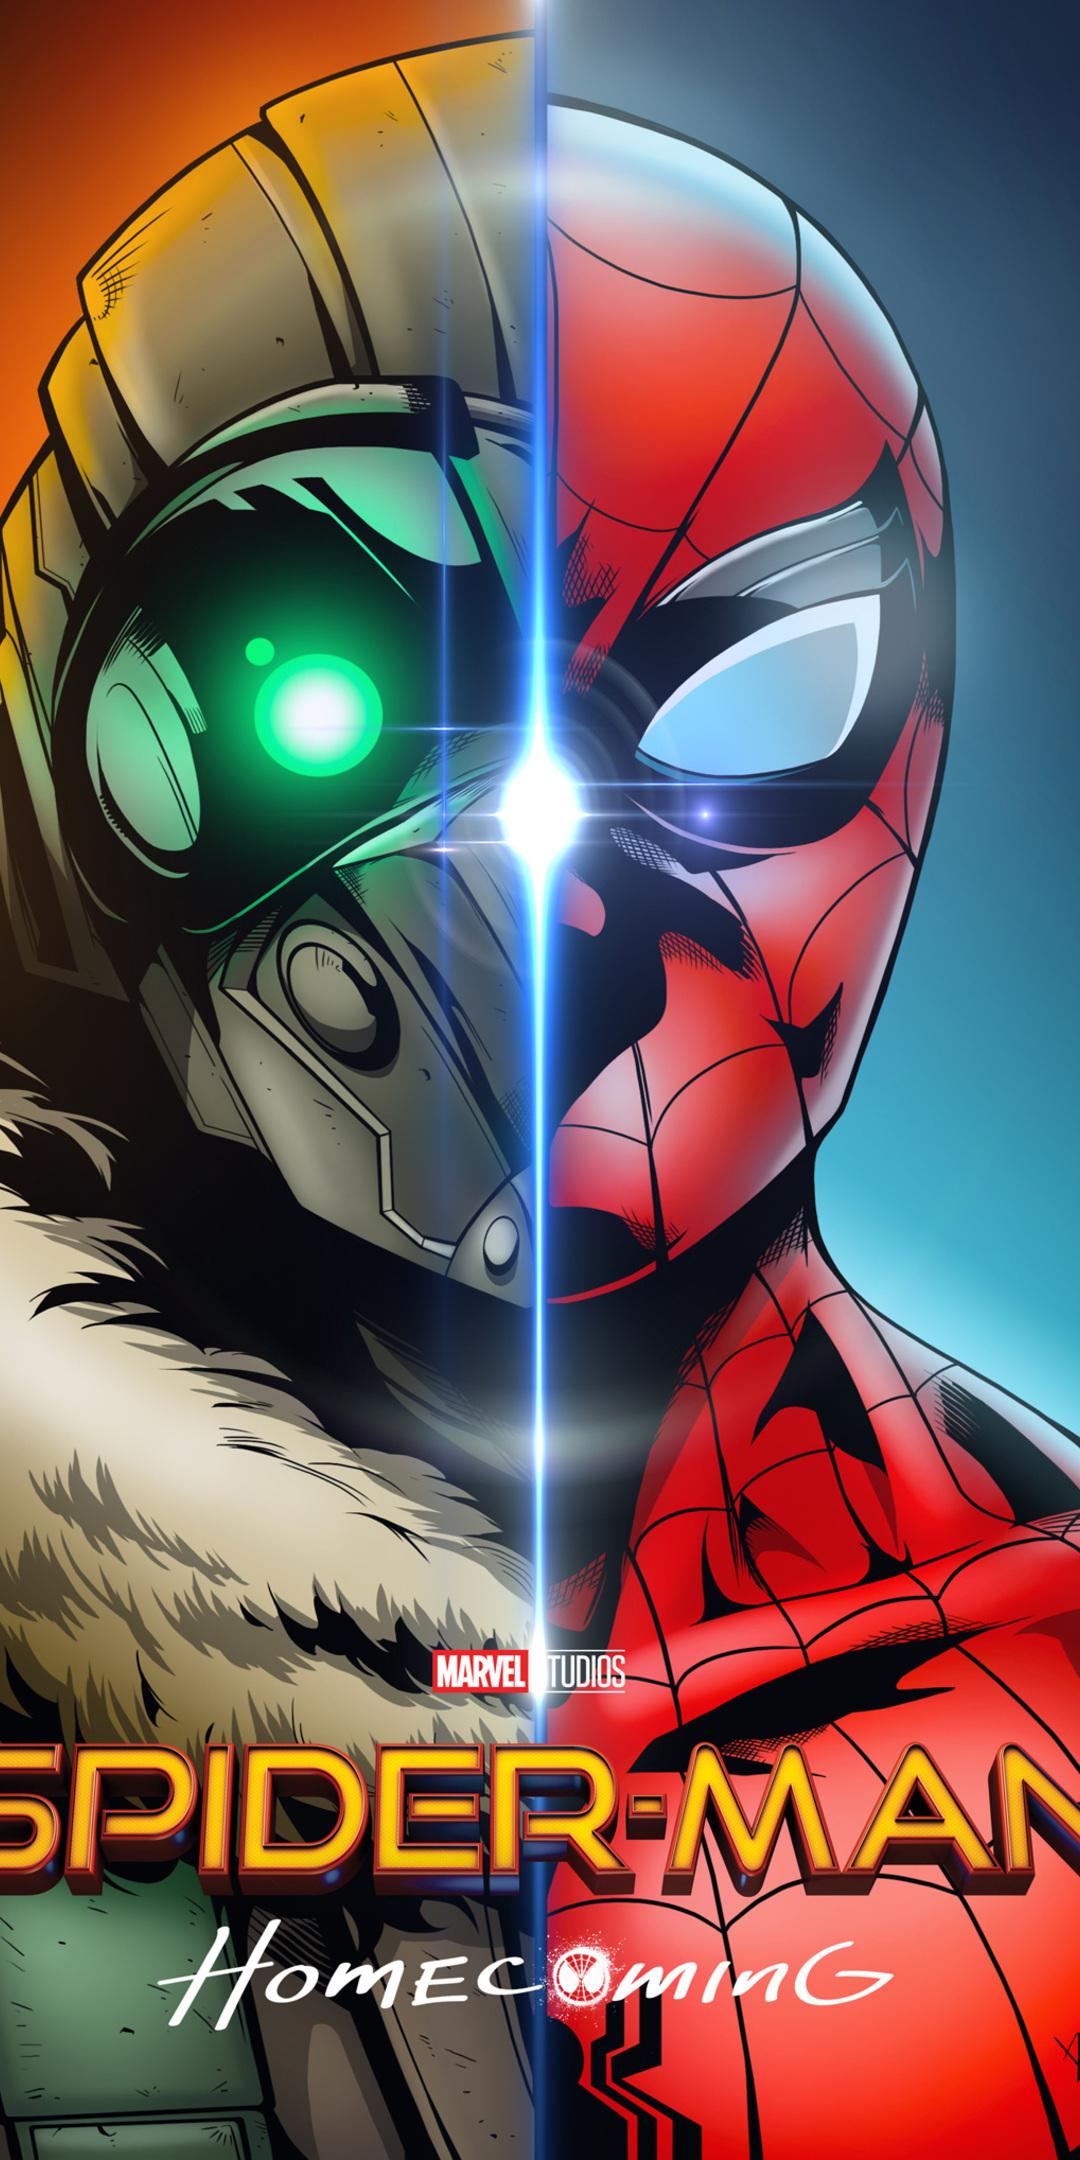 spider-man-homecoming-art-fn.jpg